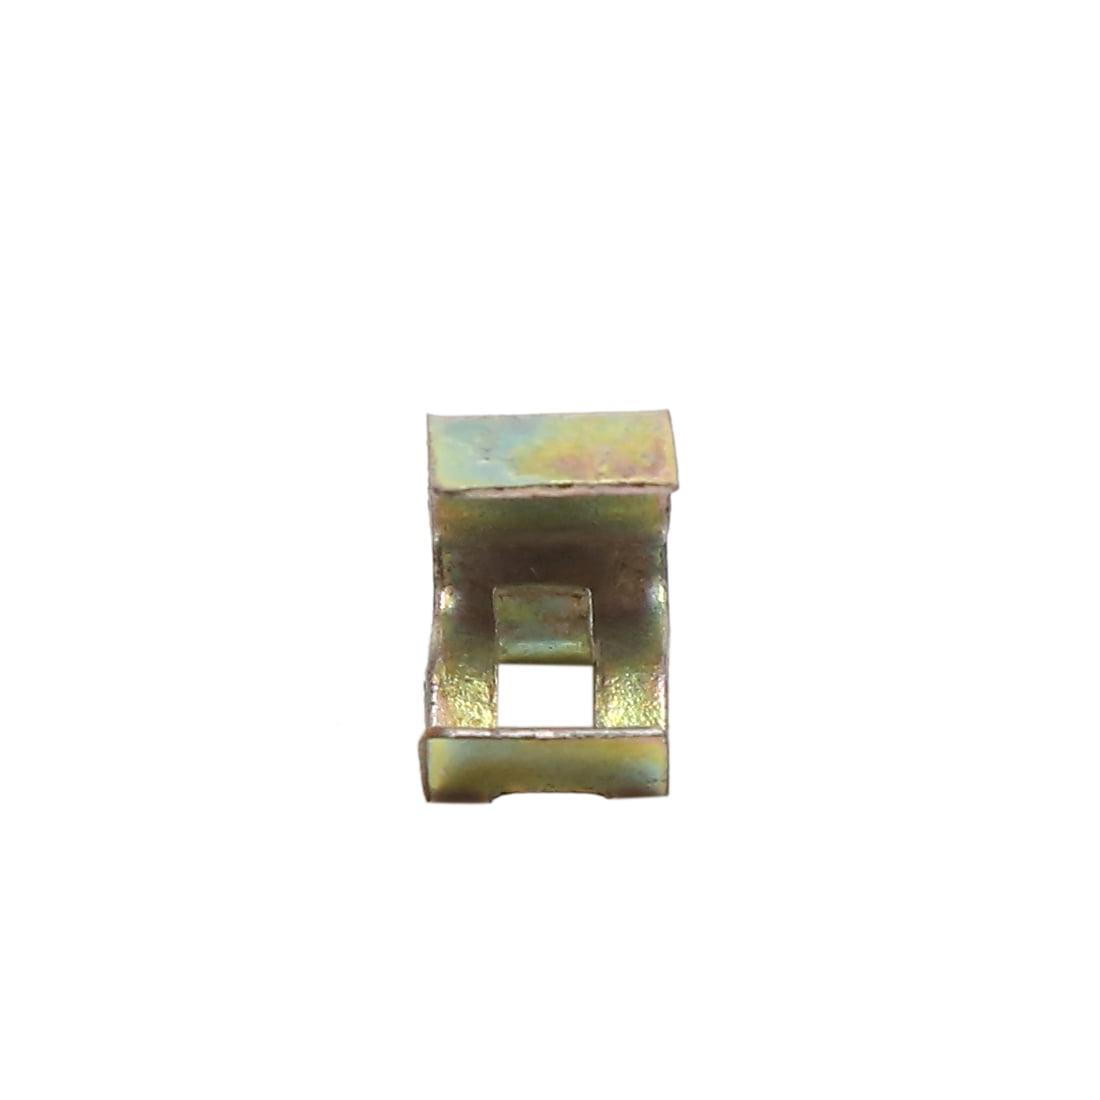 10Pcs 12mm Hole Metal Rivets Car Interior Dashboard Panel Trim Clips Retainer - image 1 de 4